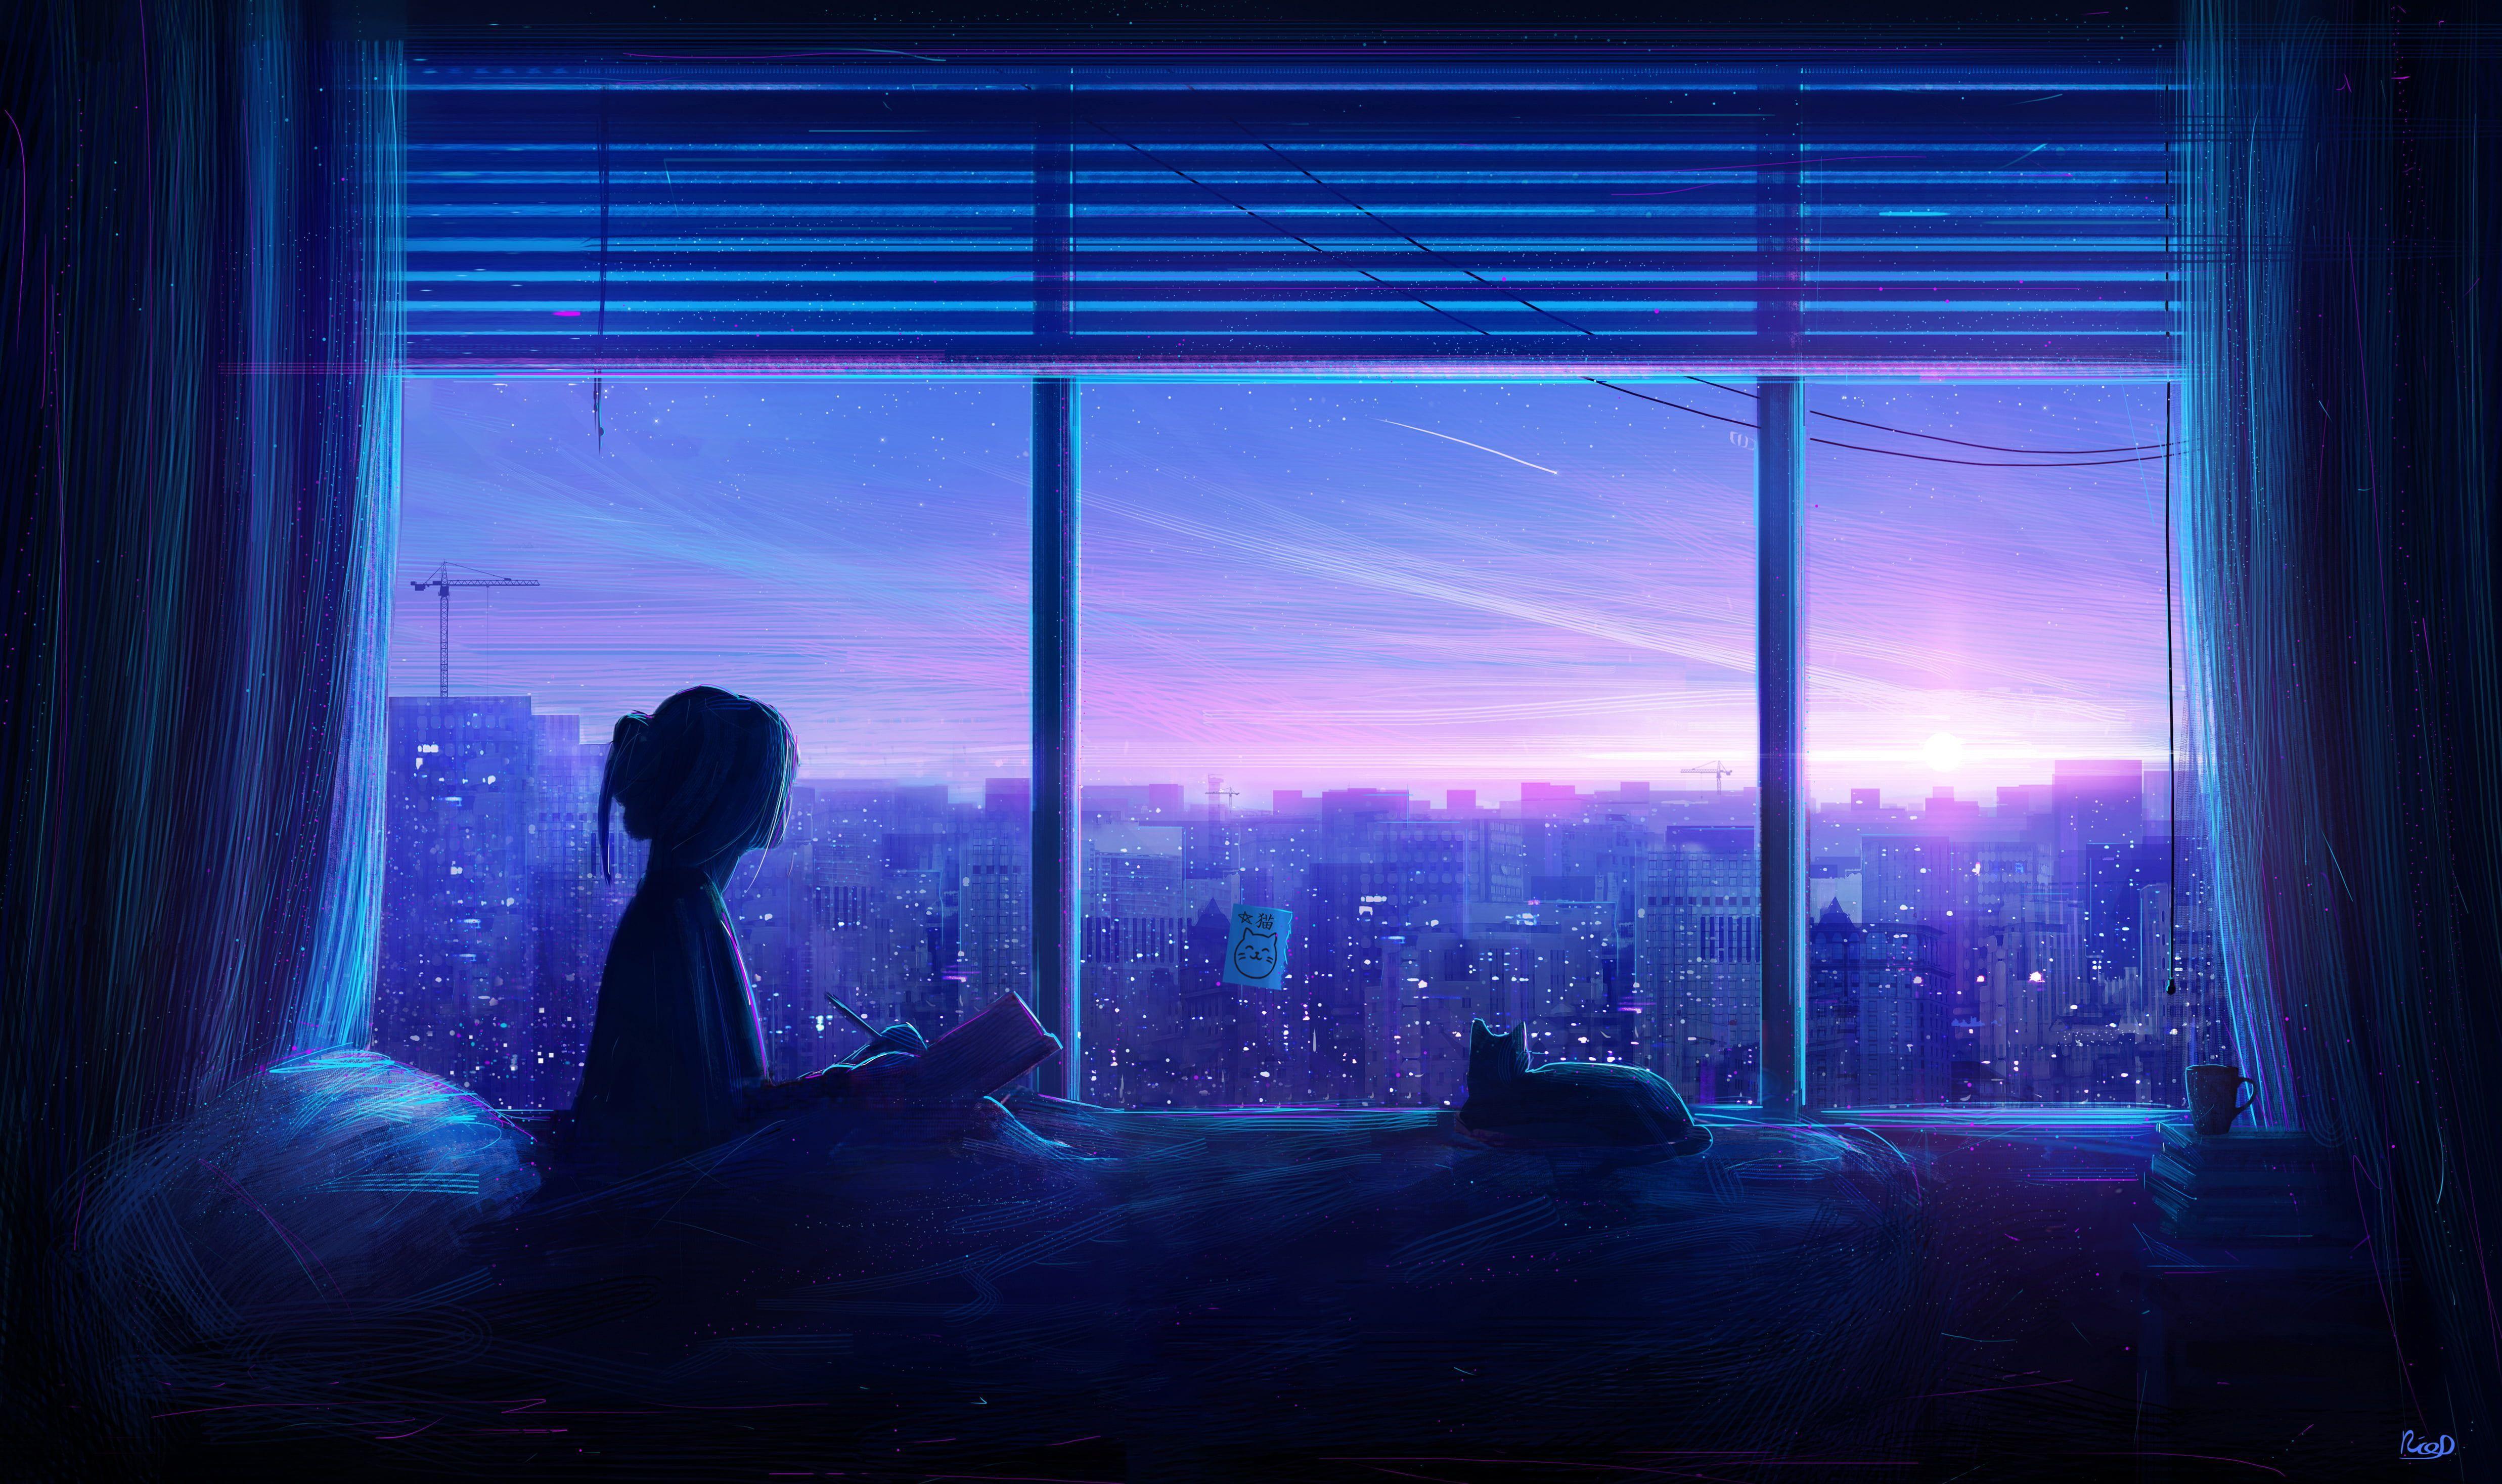 Blue Anime Aesthetic Desktop Wallpapers Top Free Blue Anime Aesthetic Desktop Backgrounds Wallpaperaccess